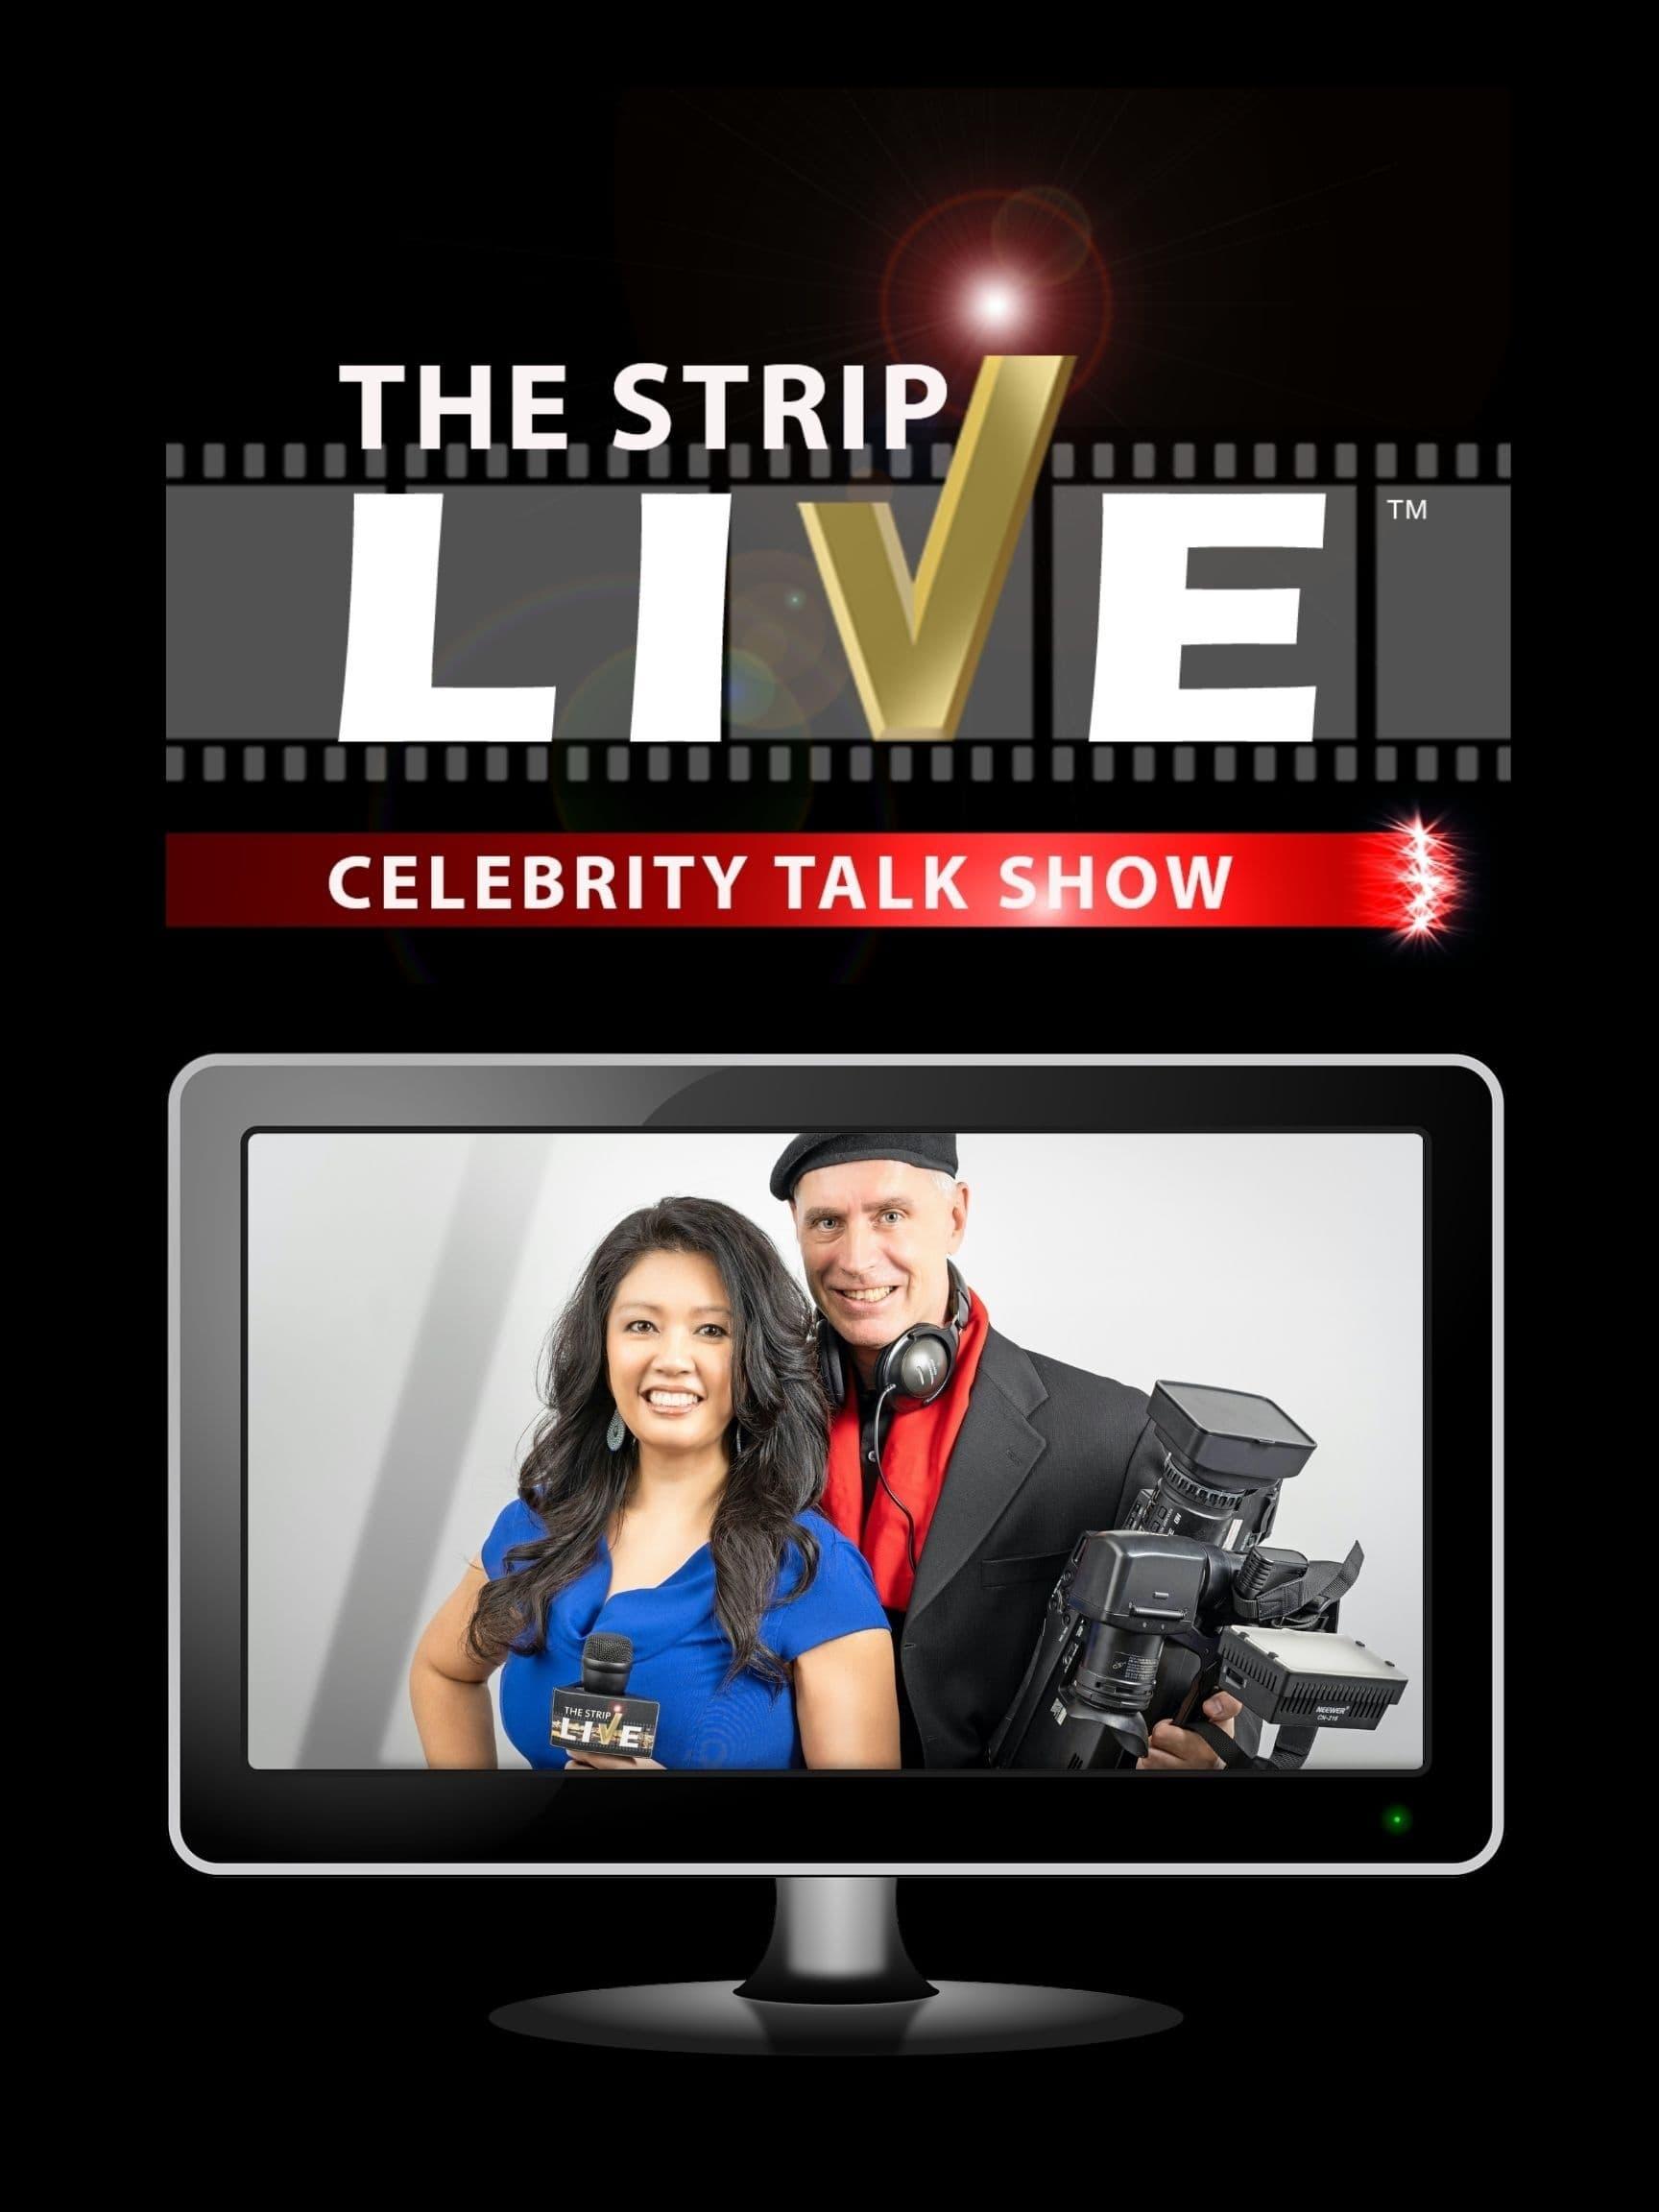 THE STRIP LIVE